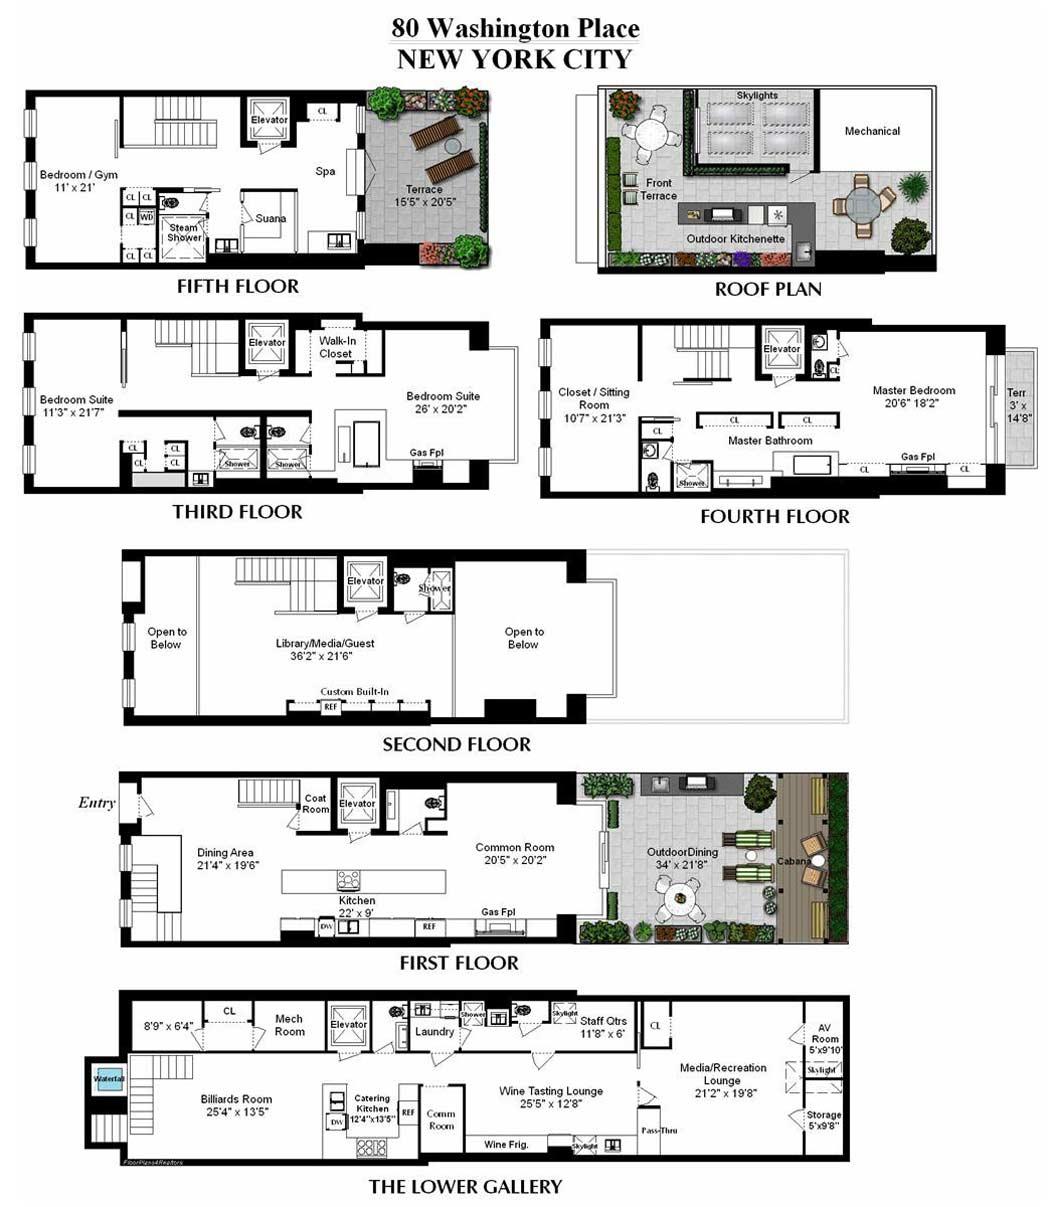 mountain garage ideas - Floor Plans Converted Townhouse in Greenwich Village in